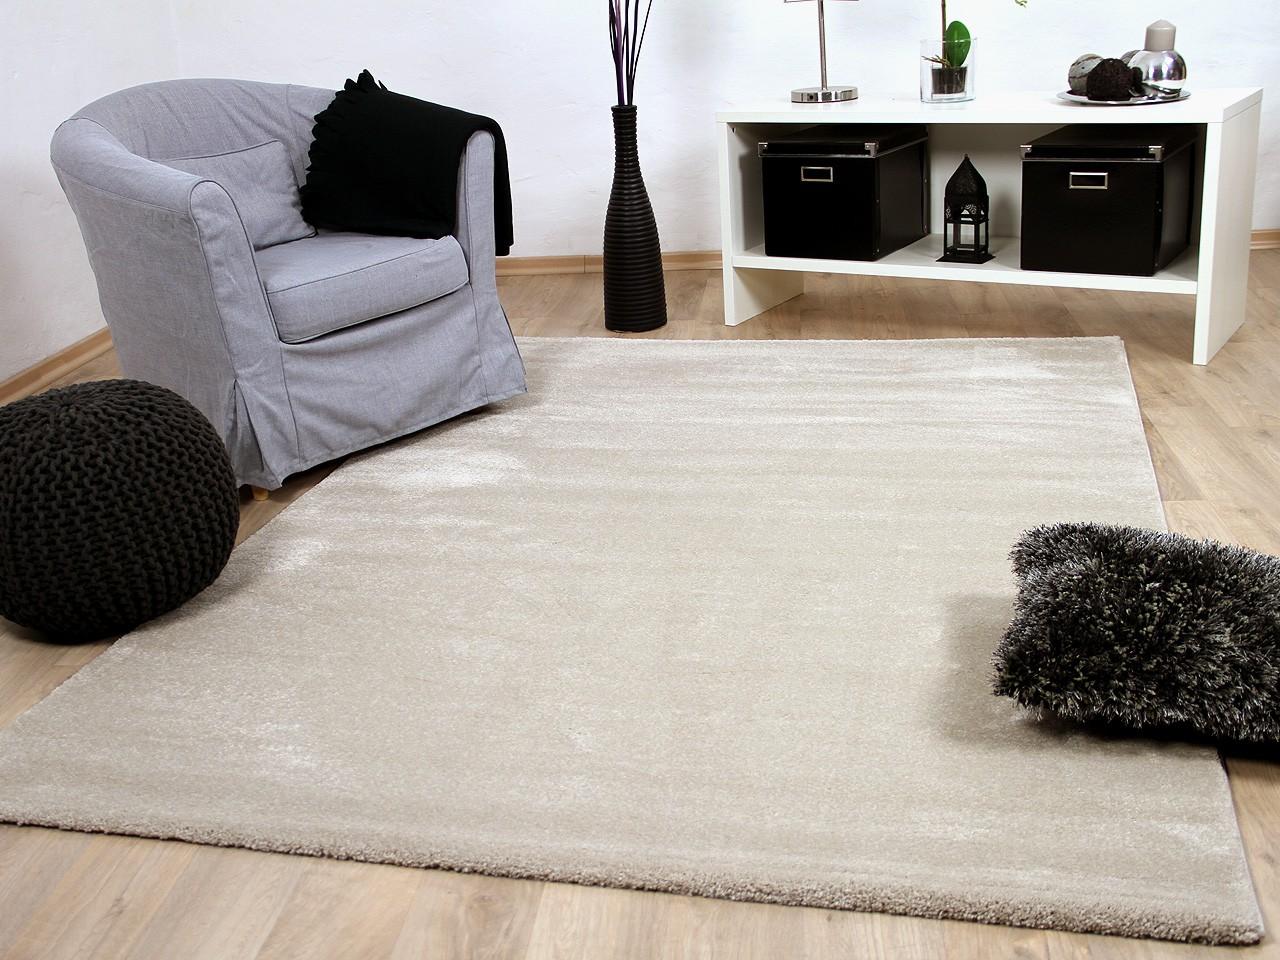 luxus soft velours teppich gala beige teppiche. Black Bedroom Furniture Sets. Home Design Ideas